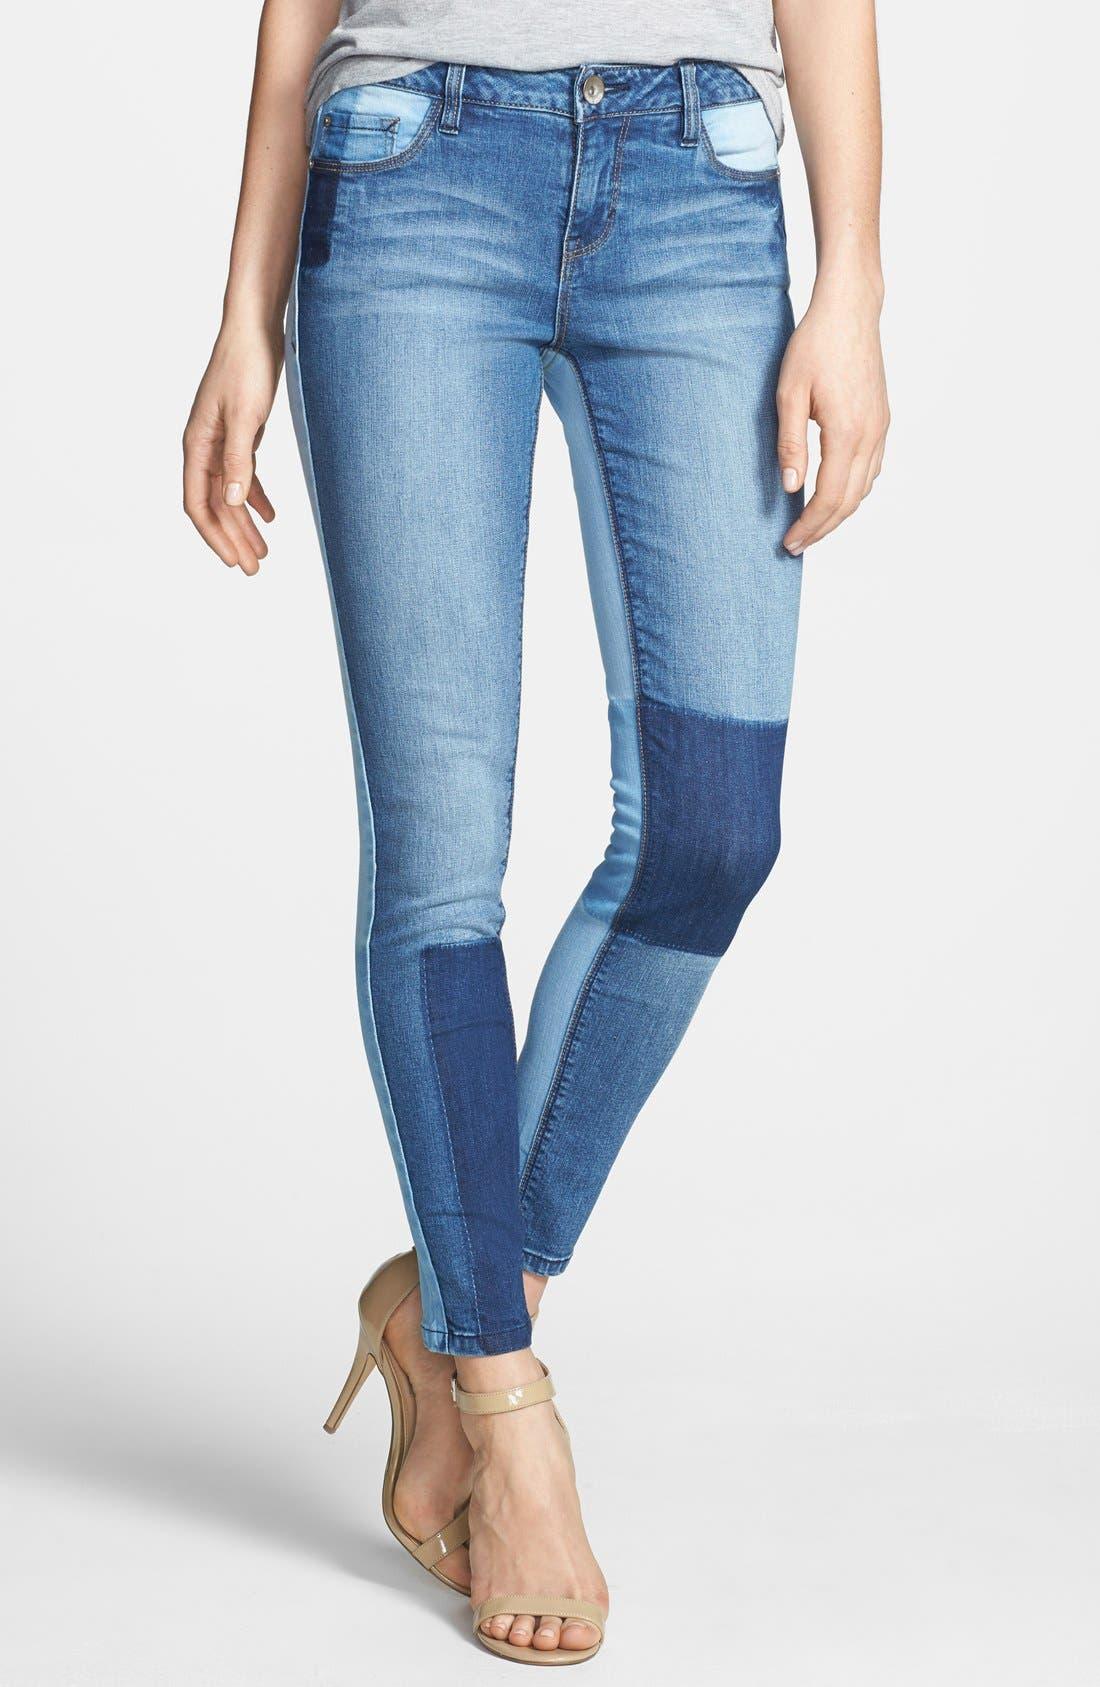 Alternate Image 1 Selected - kensie 'Ankle Biter' Colorblock Skinny Jeans (Vintage Twister)